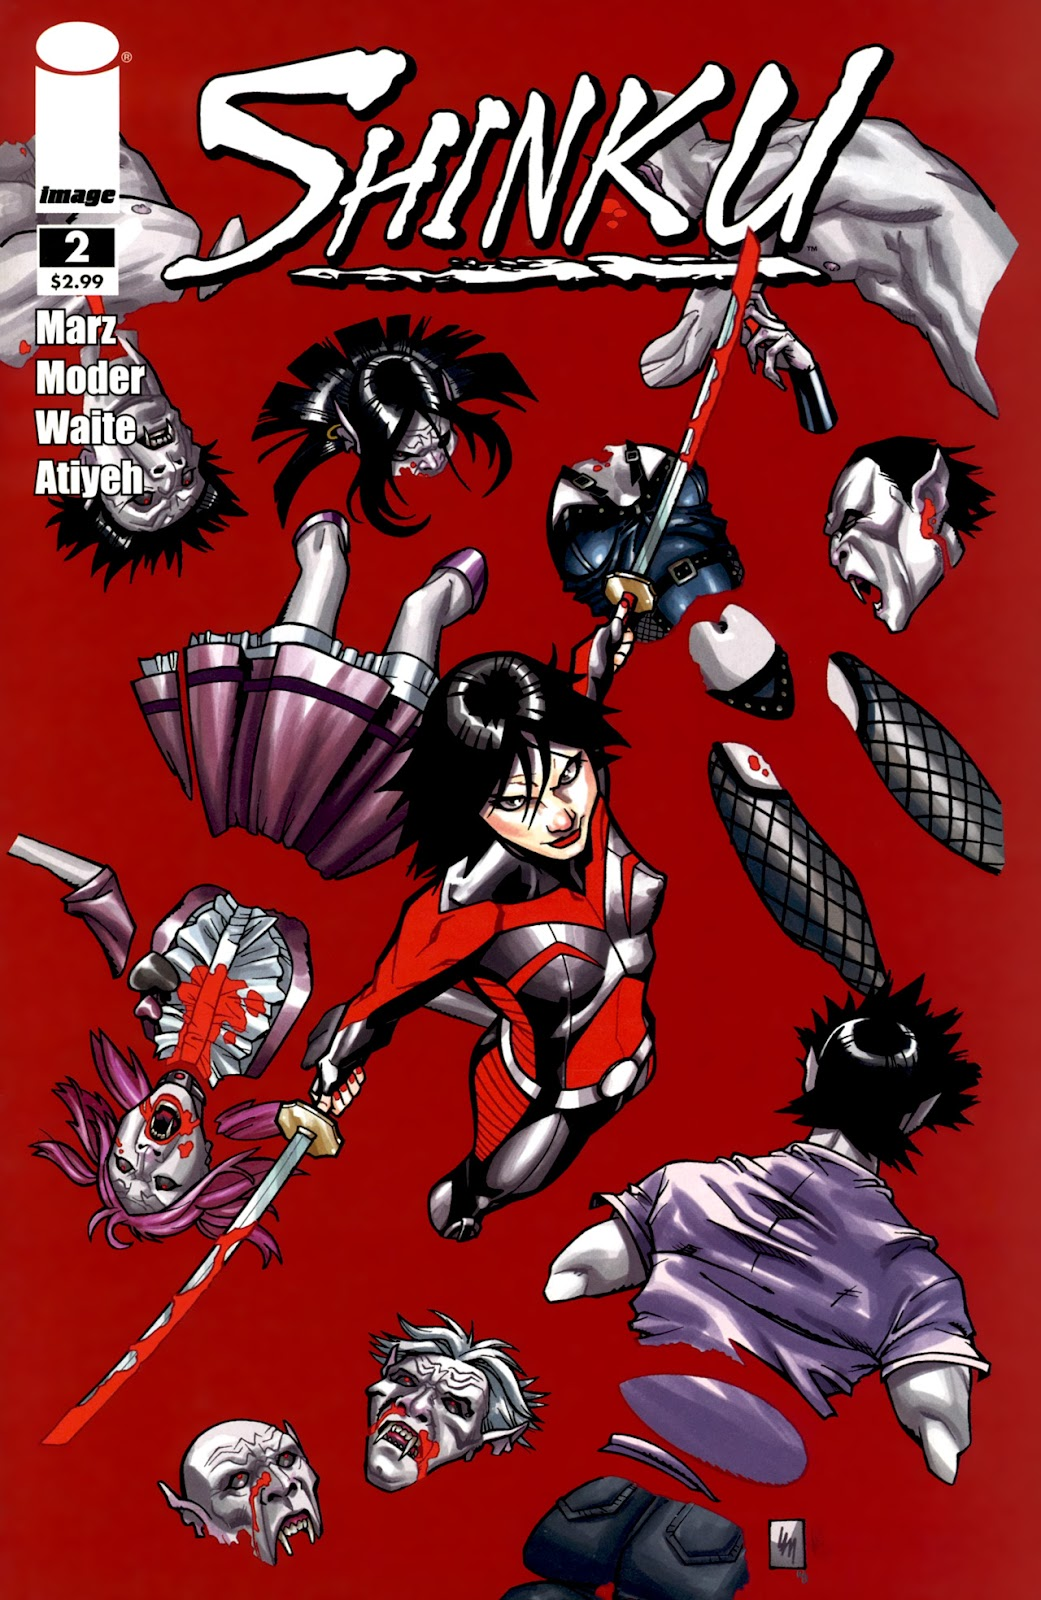 Read online Shinku comic -  Issue #2 - 1